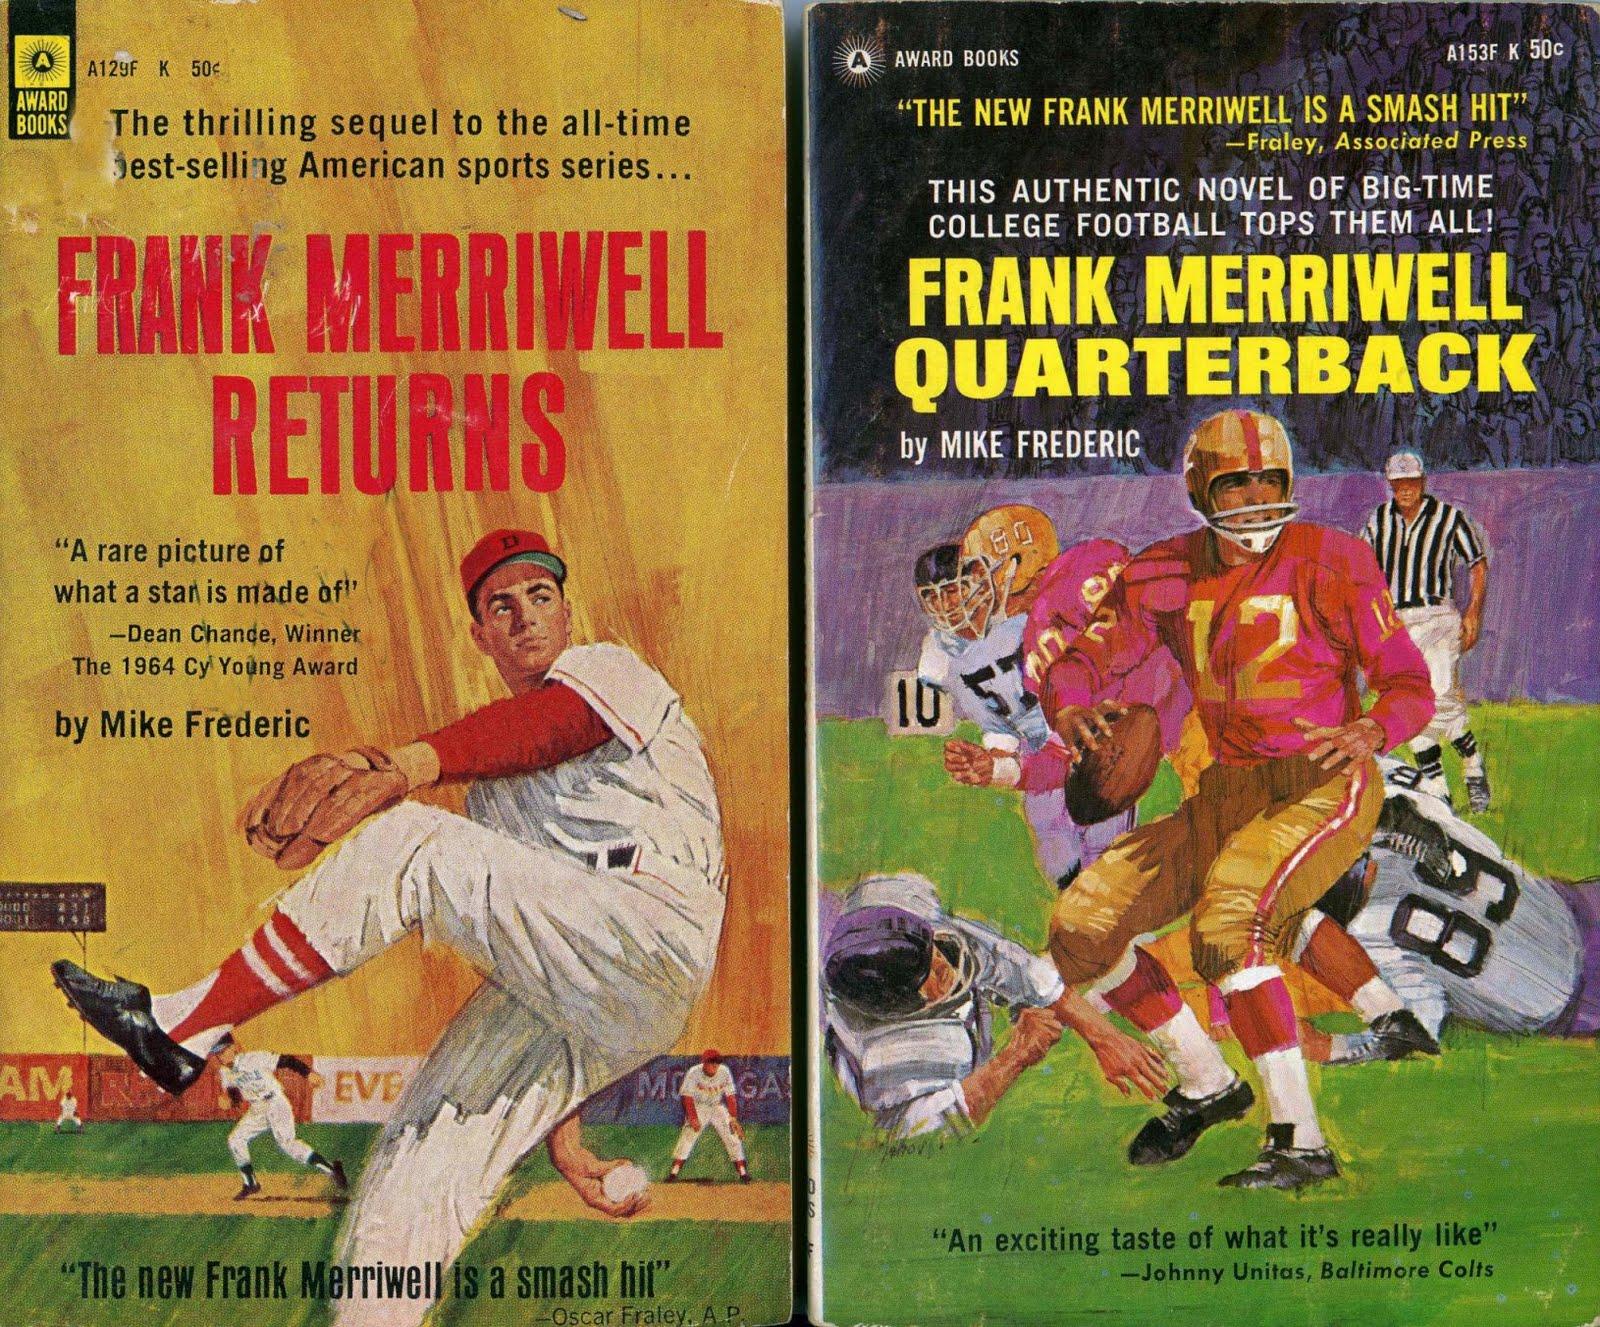 Frank Merriwell at Yale (1955) comic books